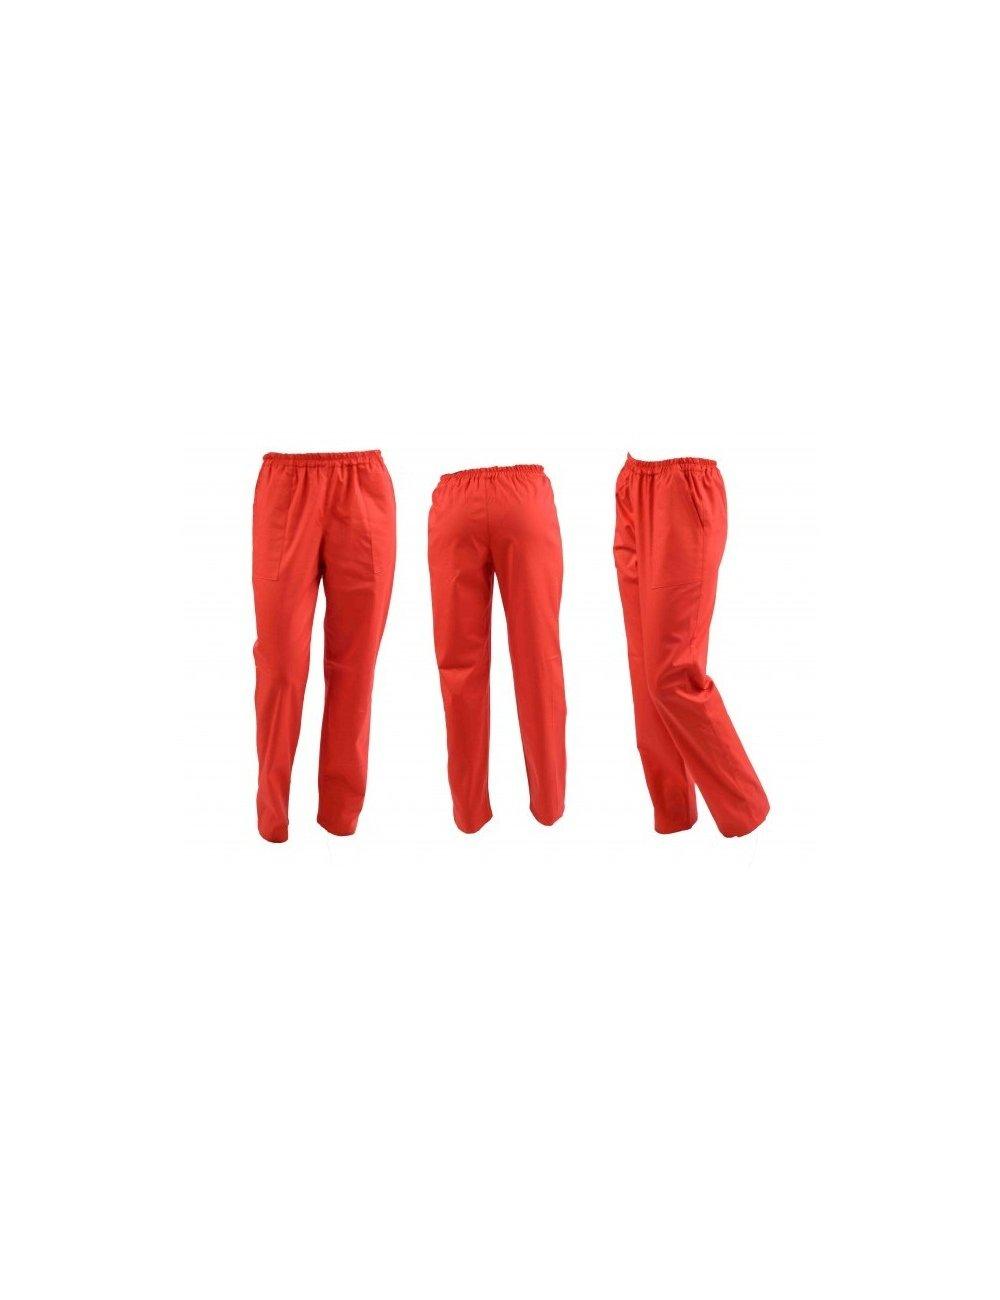 Pantaloni unisex rosii cu elastic si doua buzunare laterale